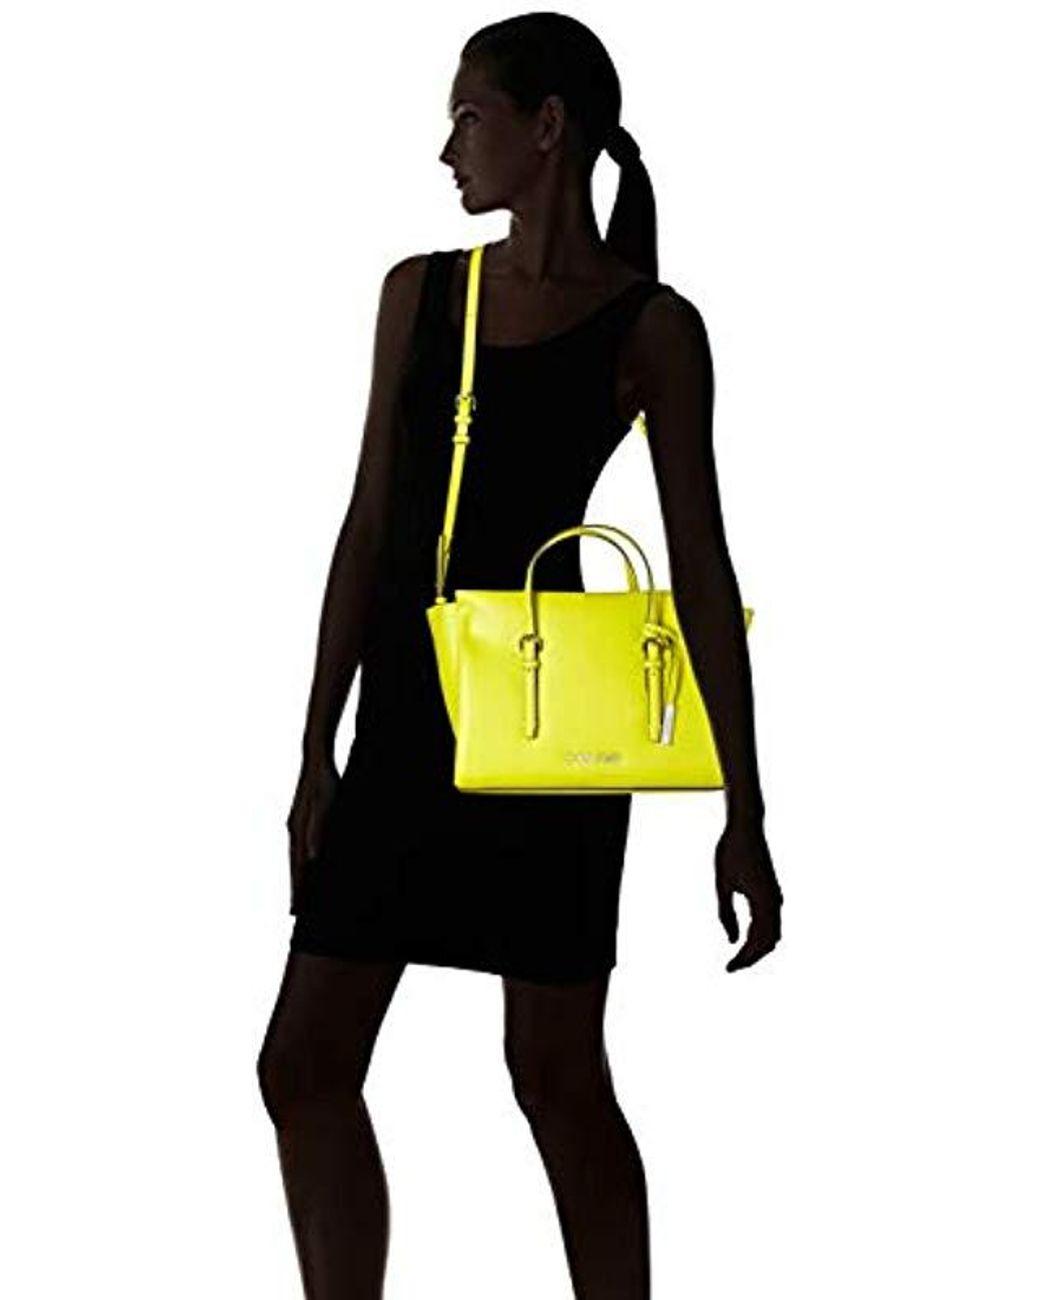 83f453f05c Calvin Klein Avant Small Tote Tote in Yellow - Lyst